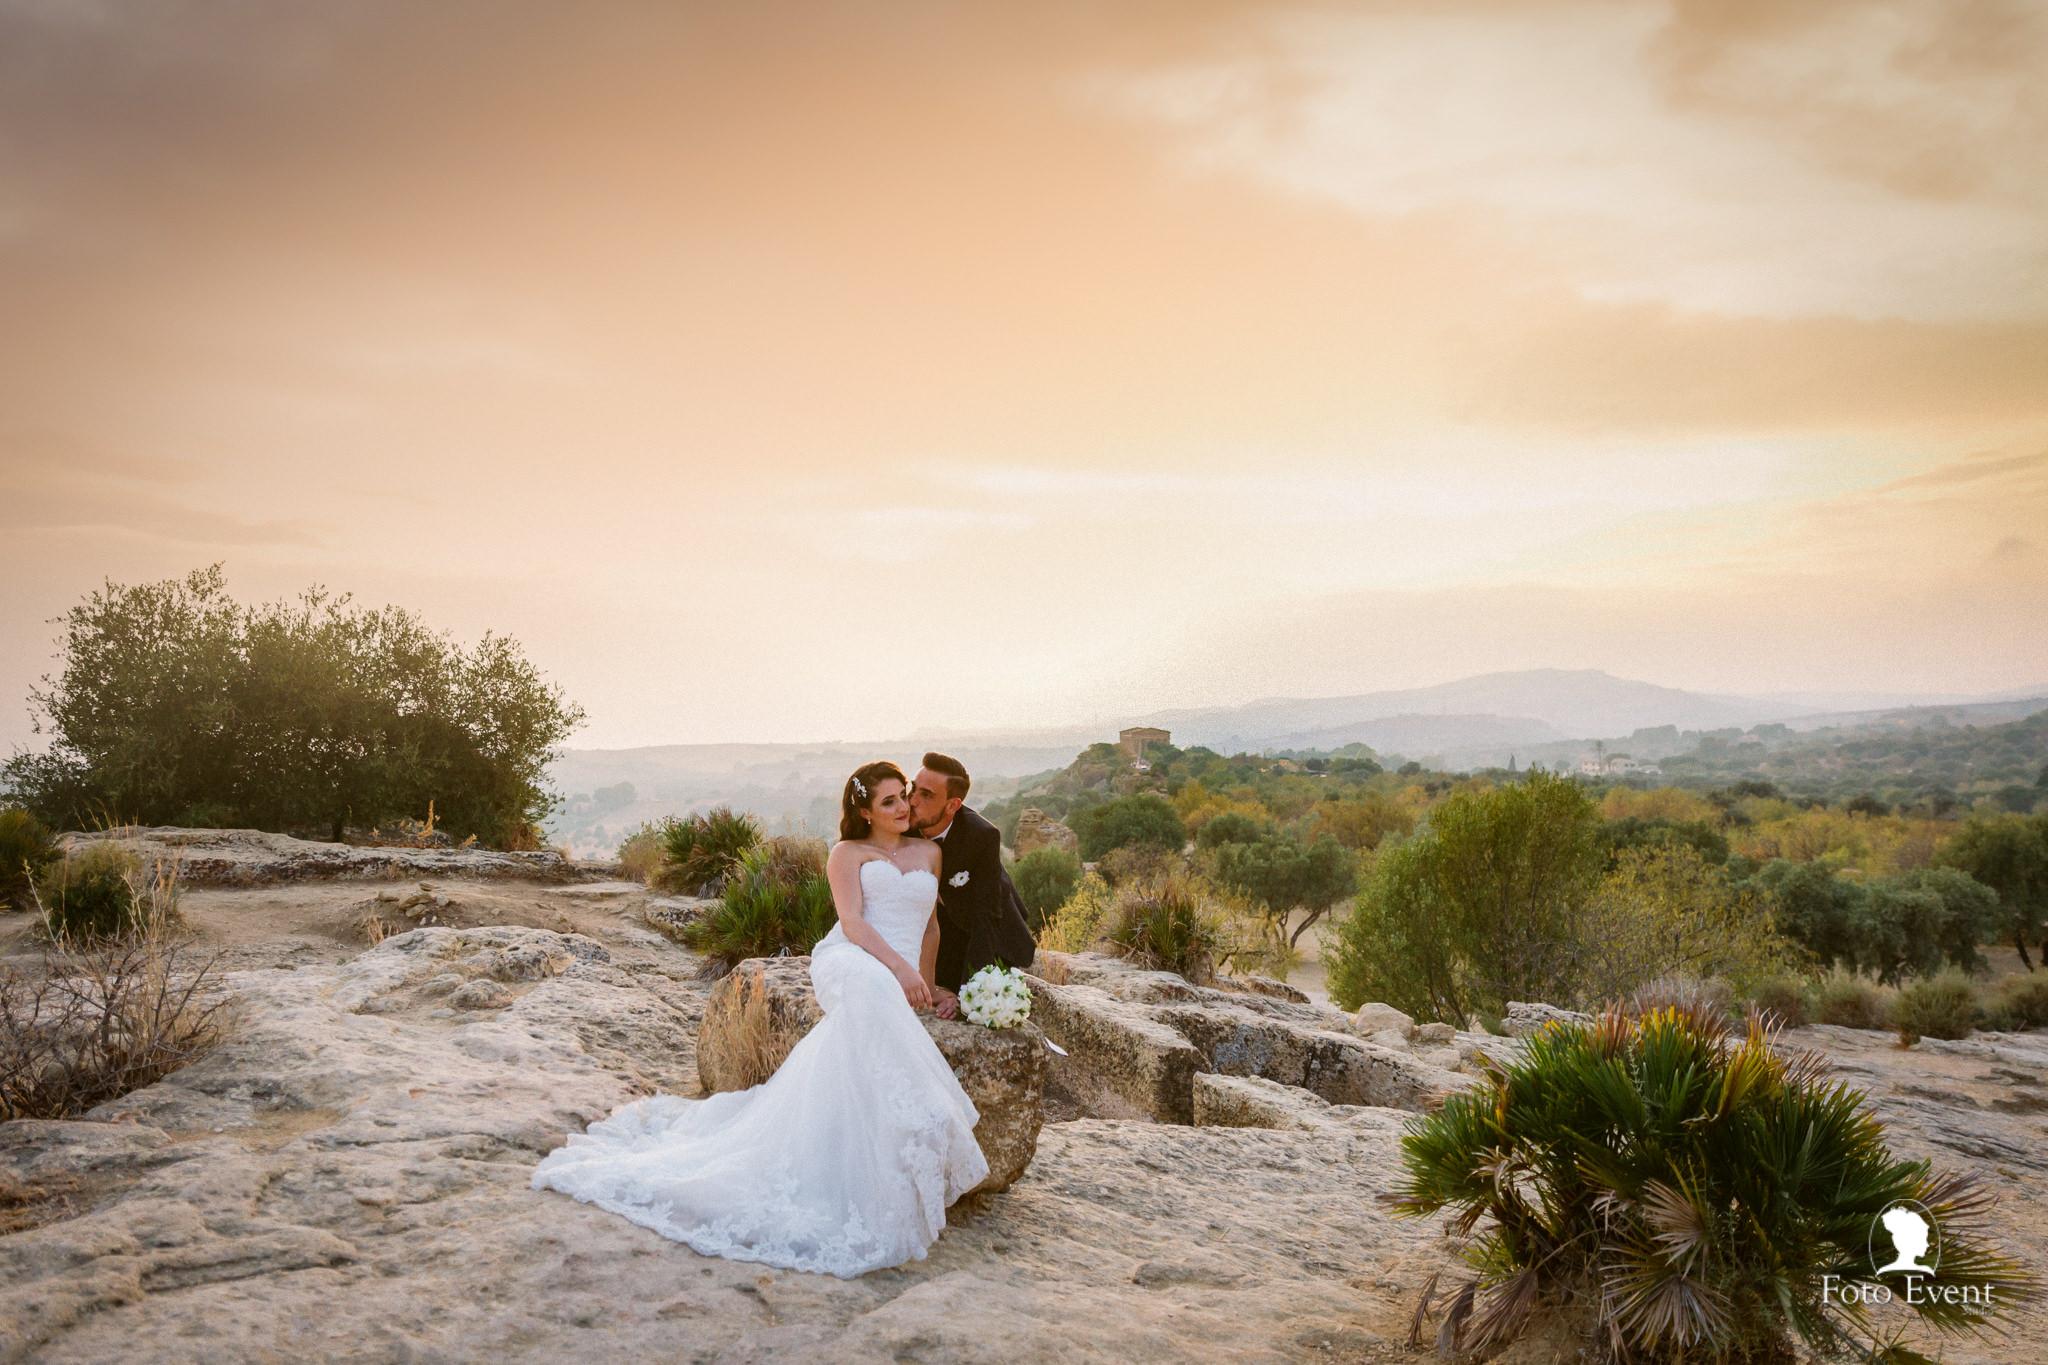 042-2019-08-31-Matrimonio-Serena-e-Saverio-Tarantino-5DE-1364